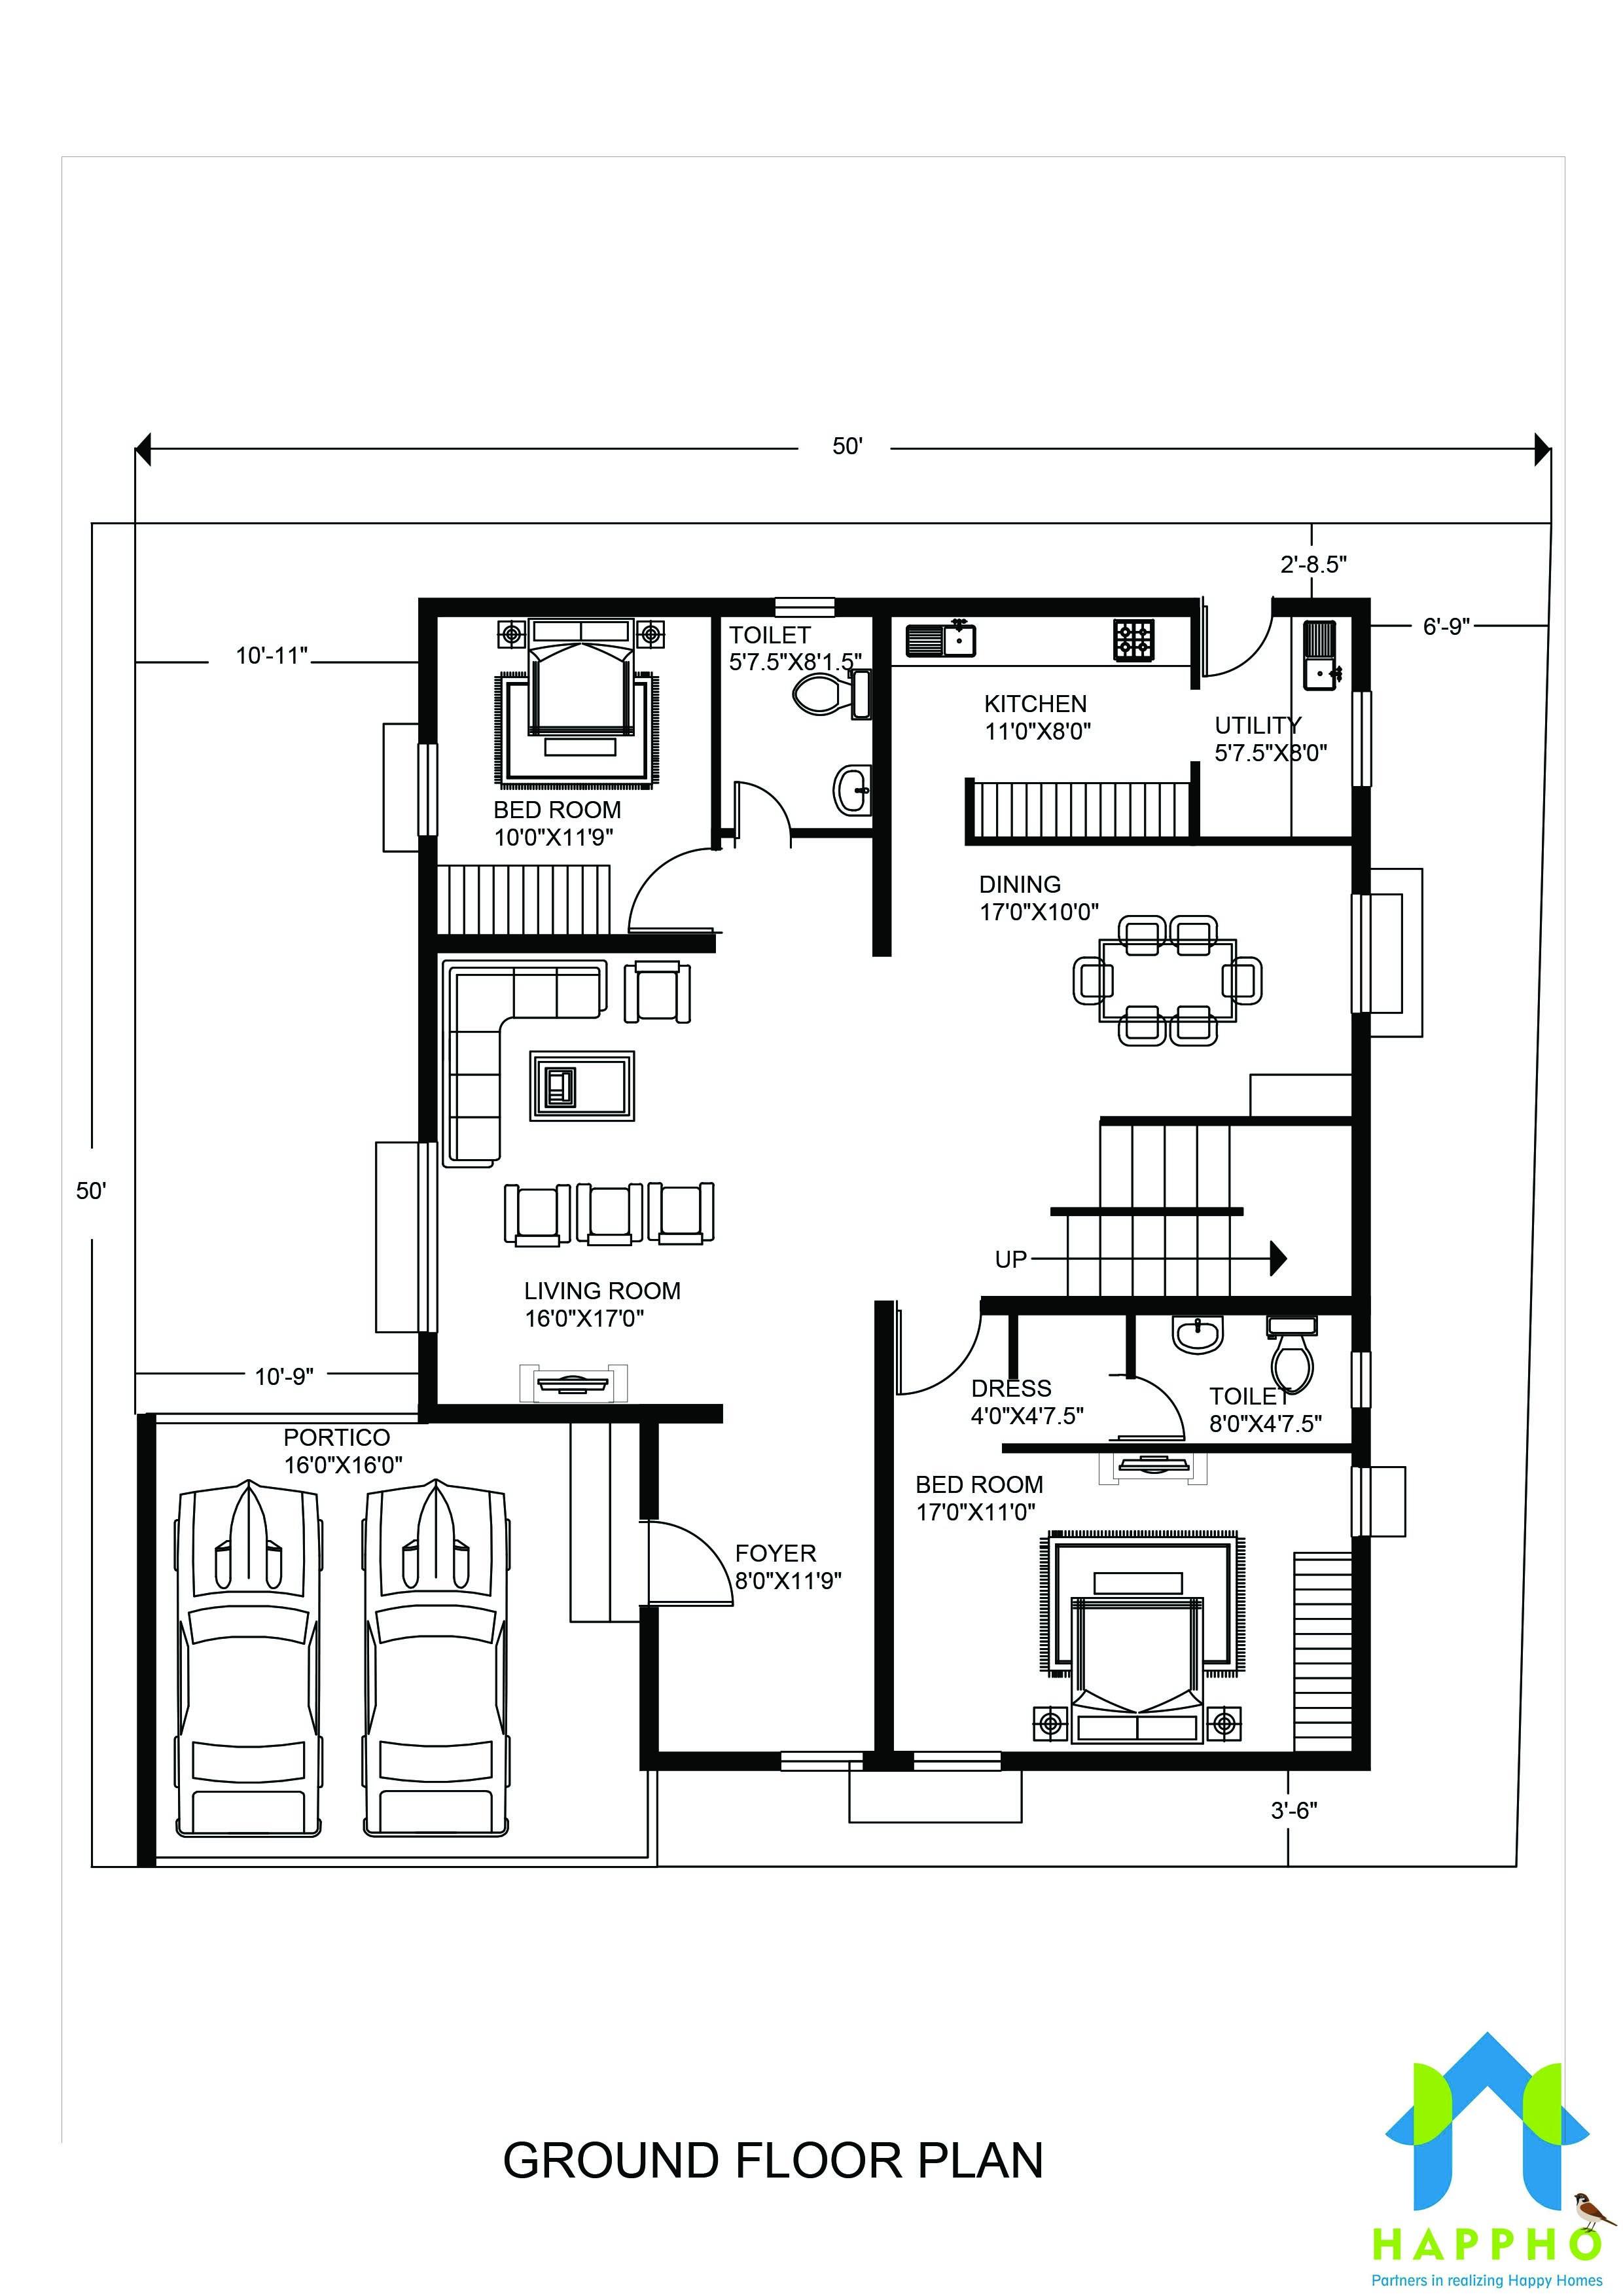 5 Bhk Floor Plan For 25 X 25 Feet Plot 2500 Square Feet